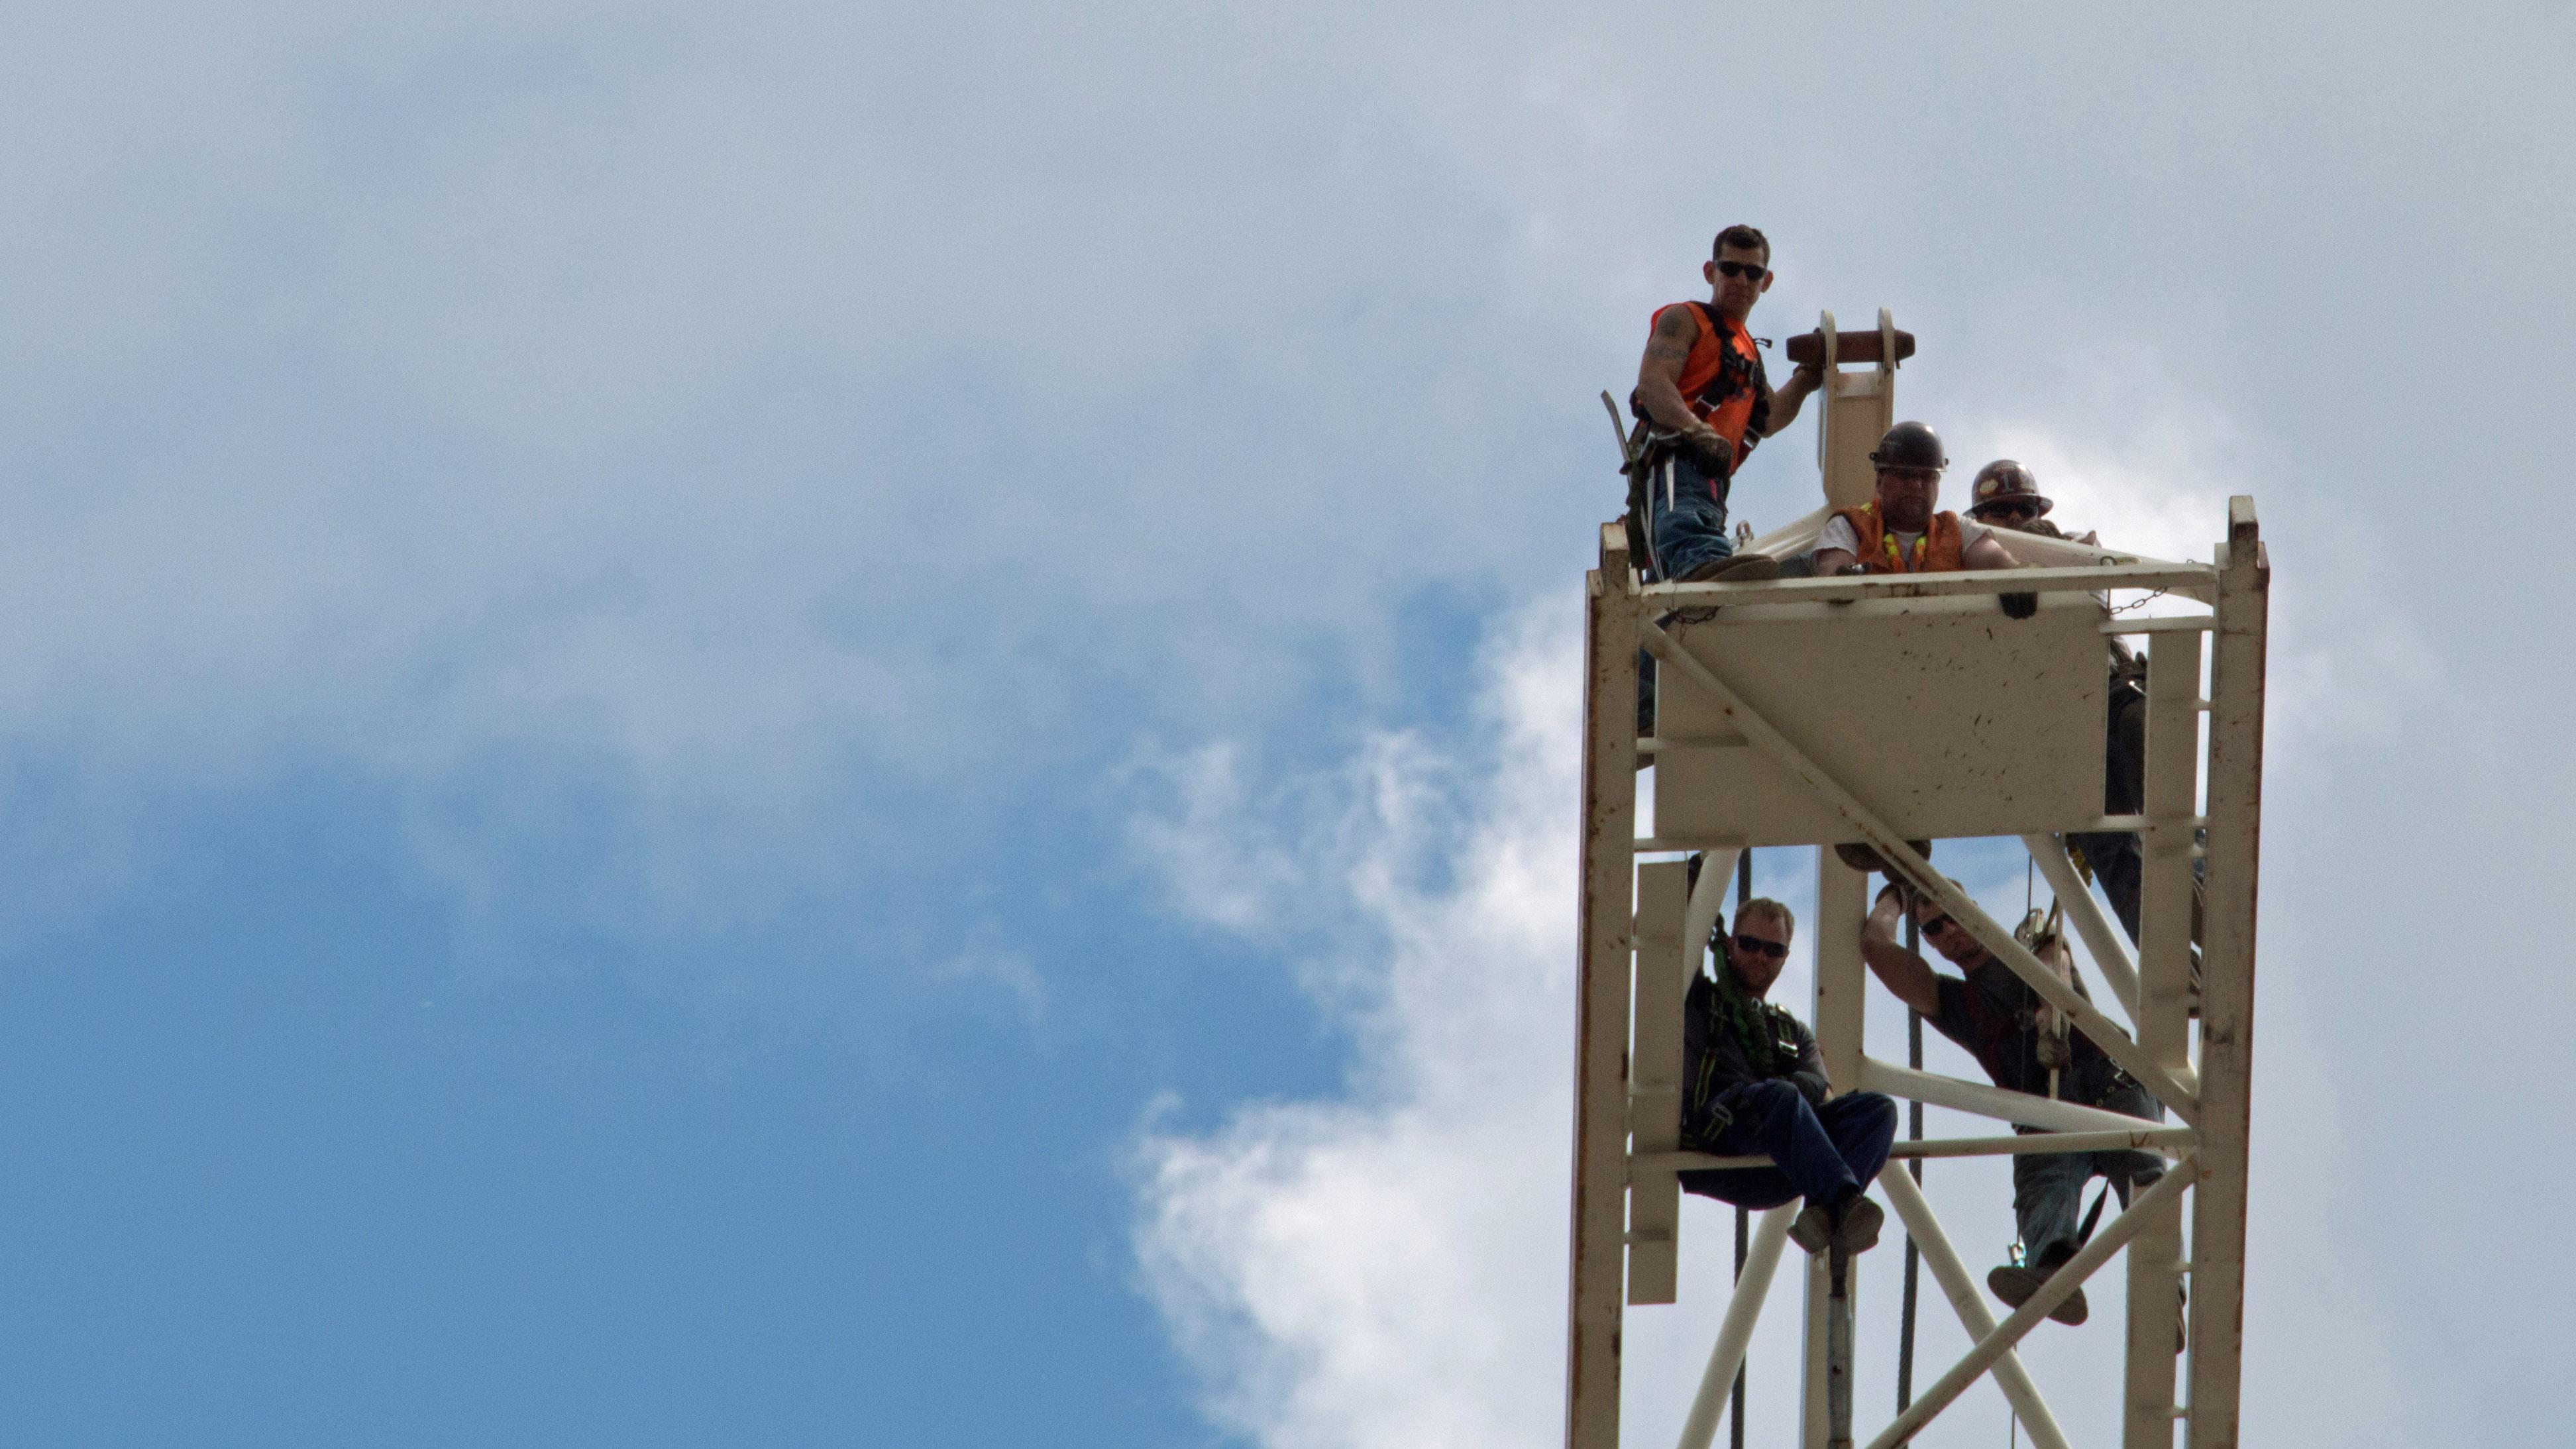 Ironworkers on beam photo Pictured: America s daring